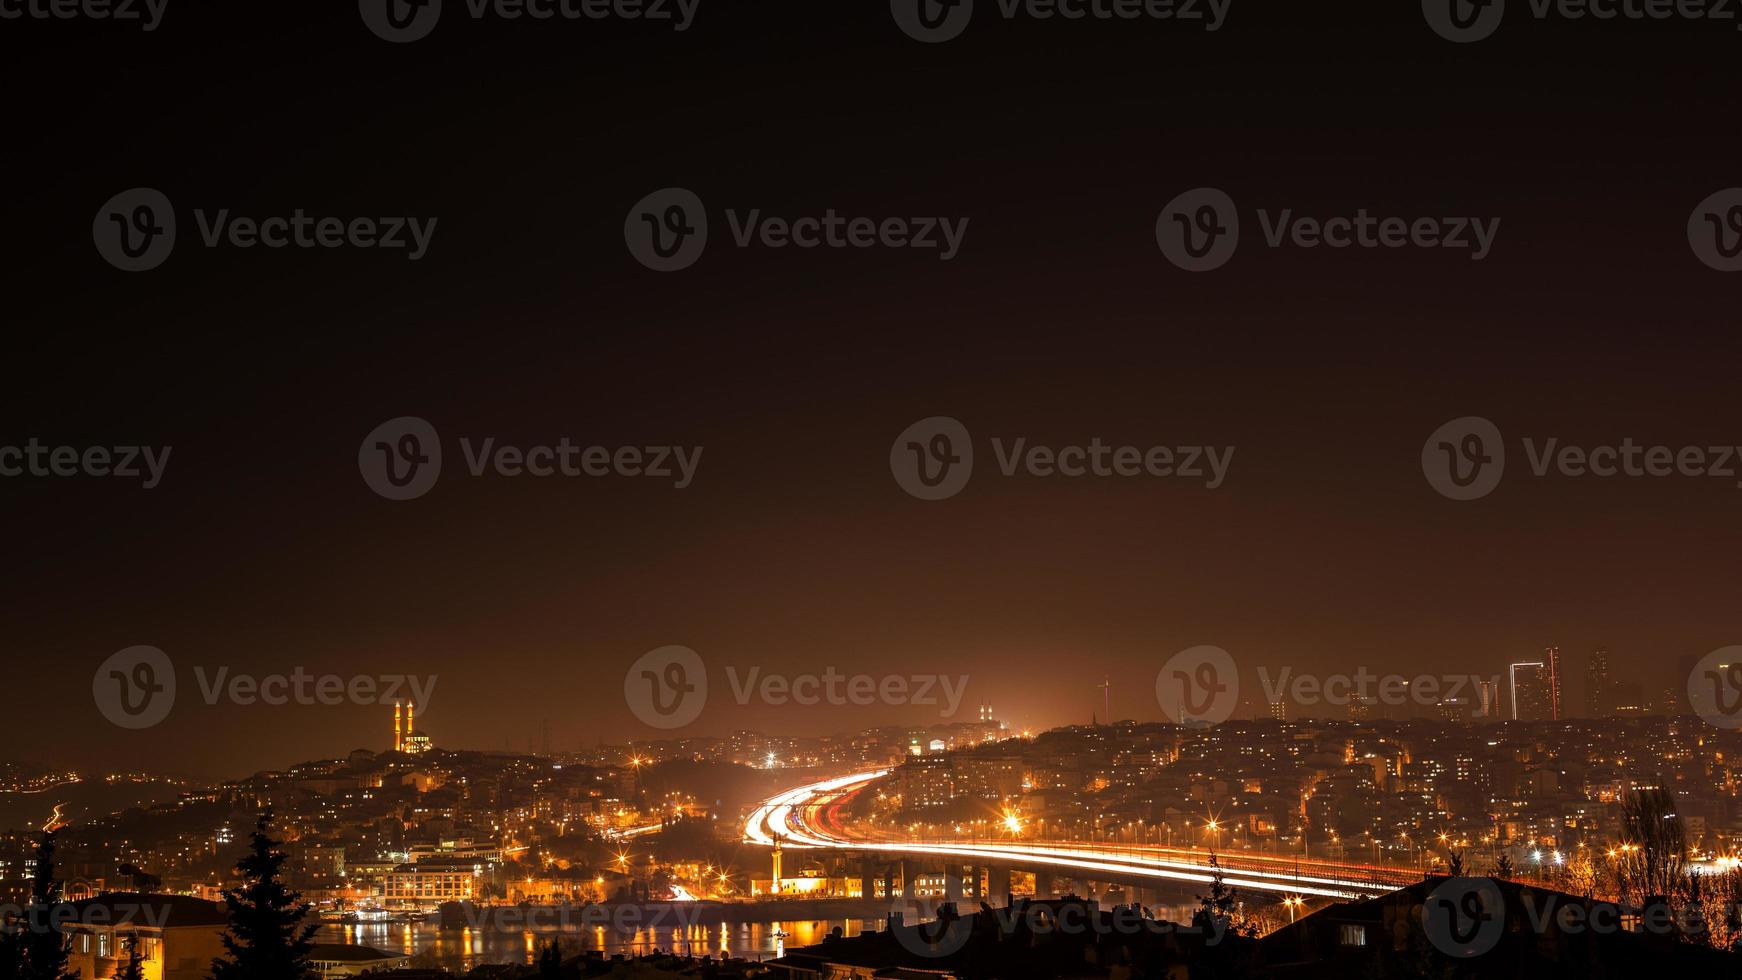 Sutluce Istanbul Eyup foto